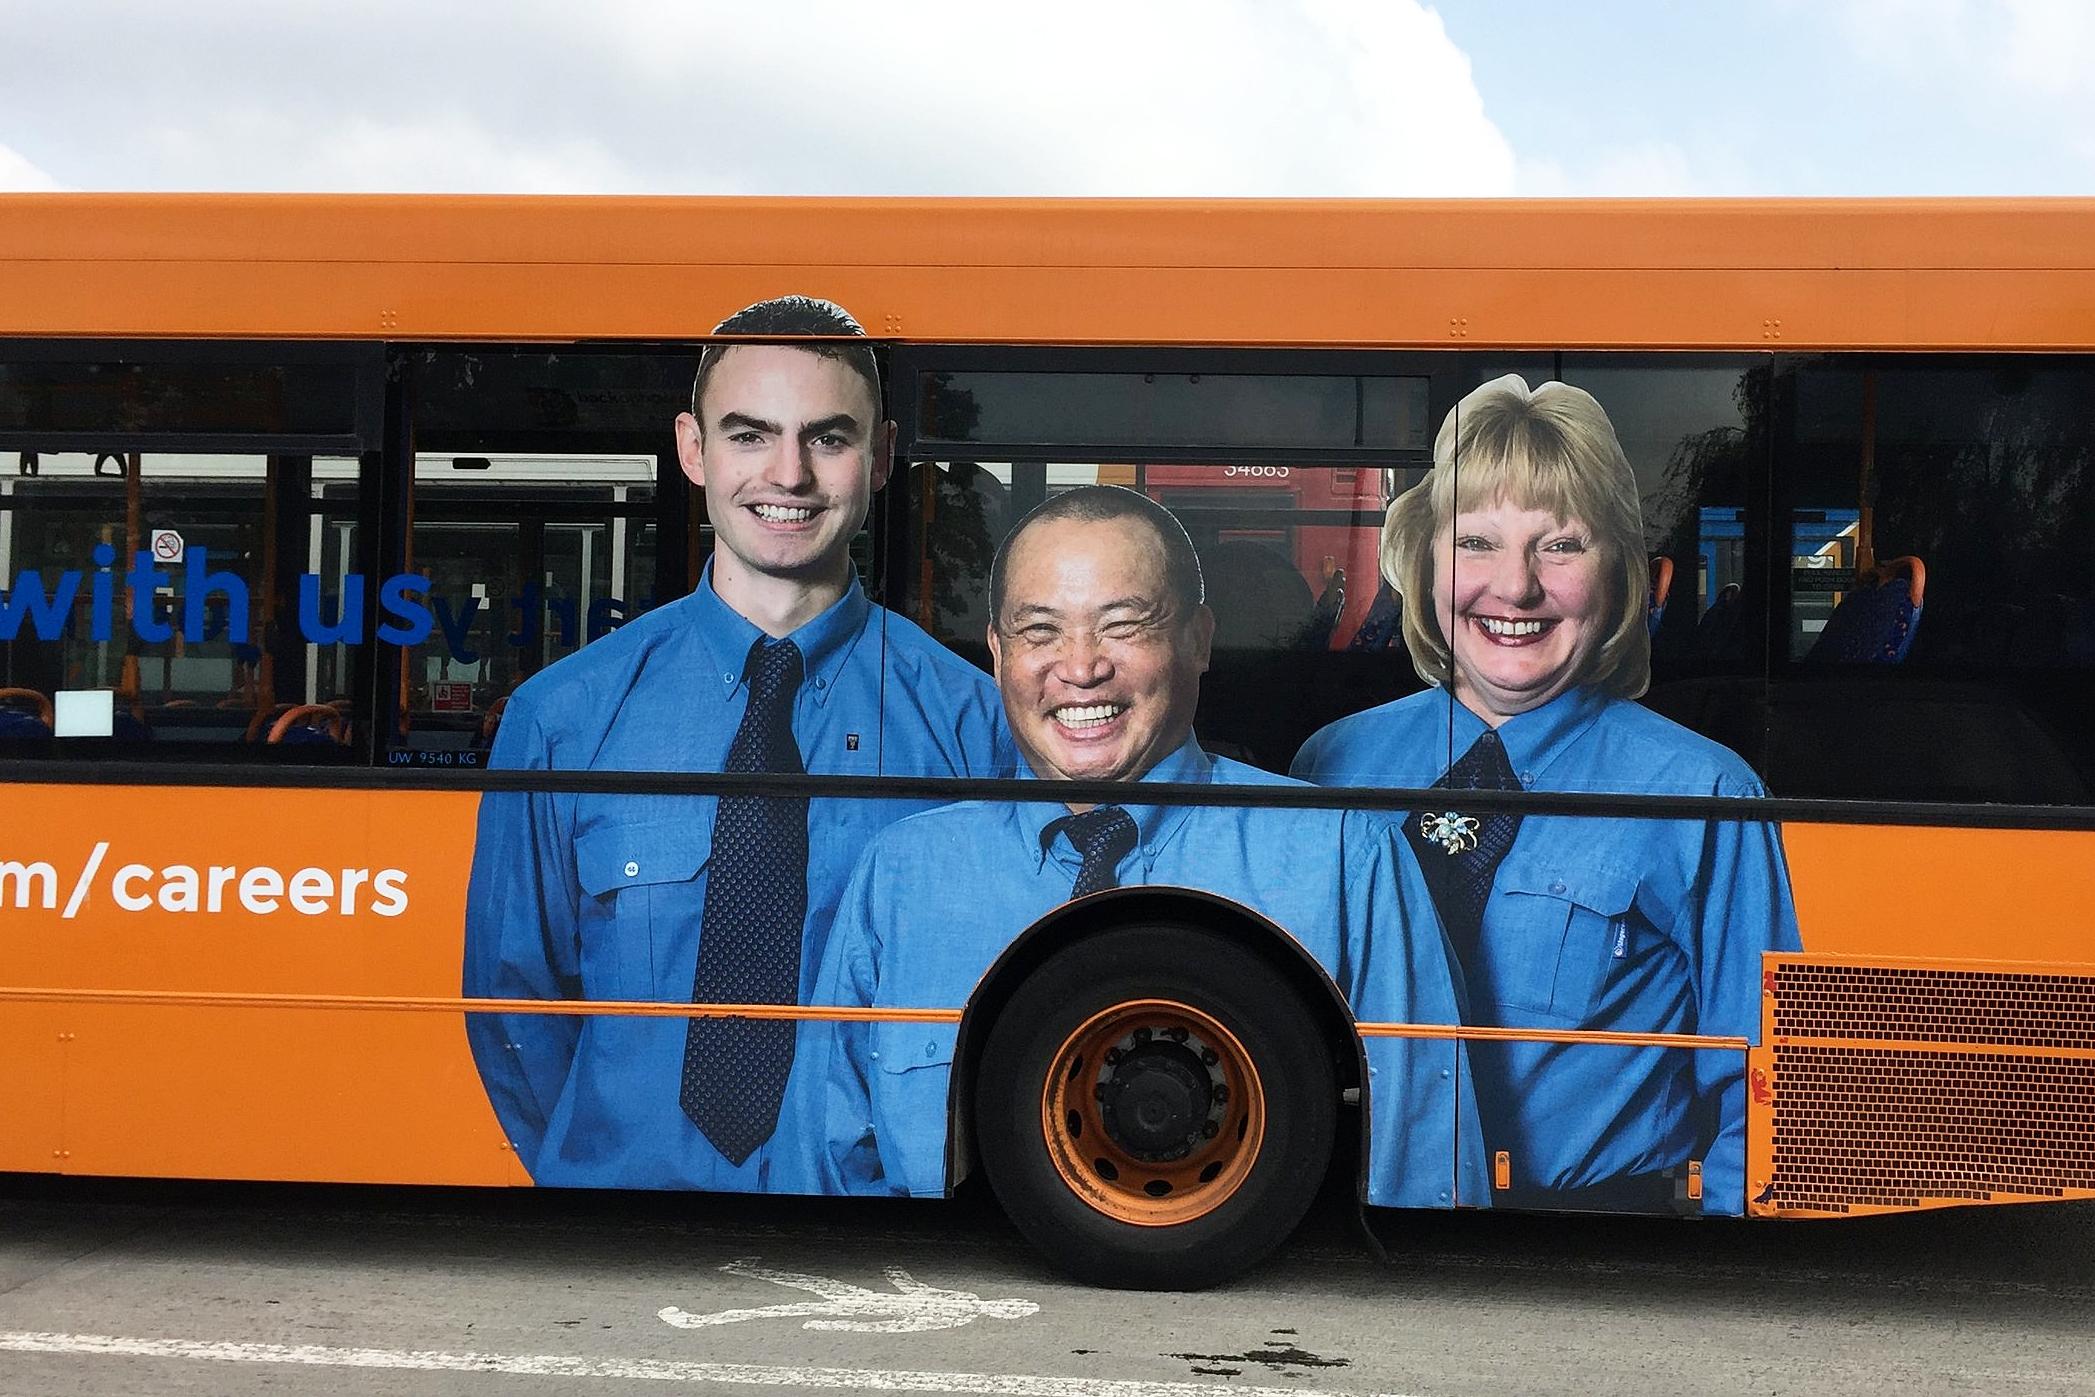 stagecoach-marketing-bus-staff-photograph